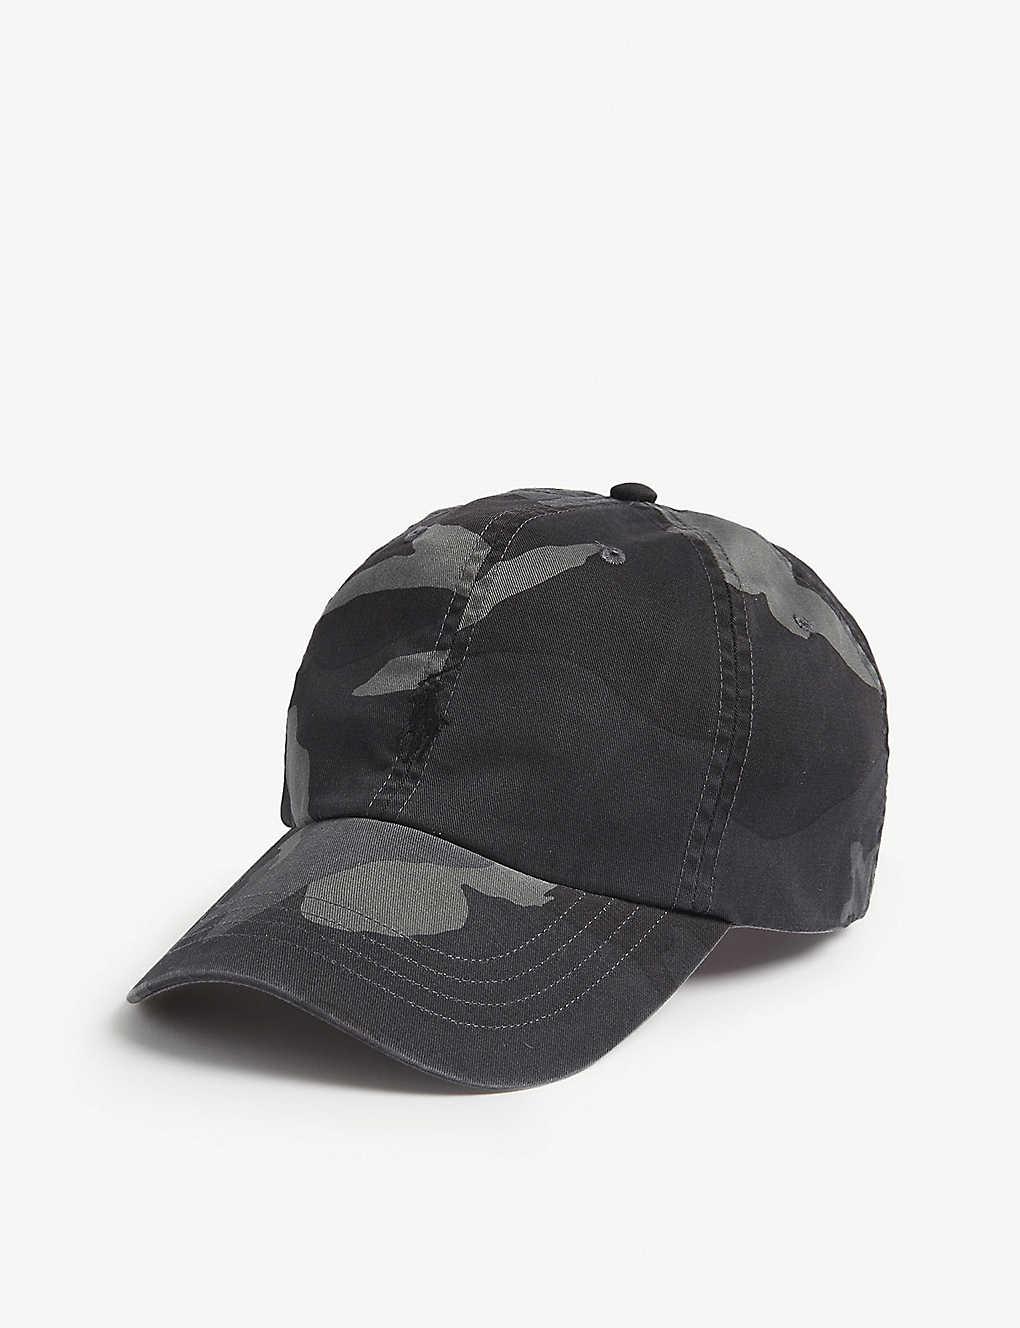 3ea3b4507f9 POLO RALPH LAUREN - Camouflage baseball cap